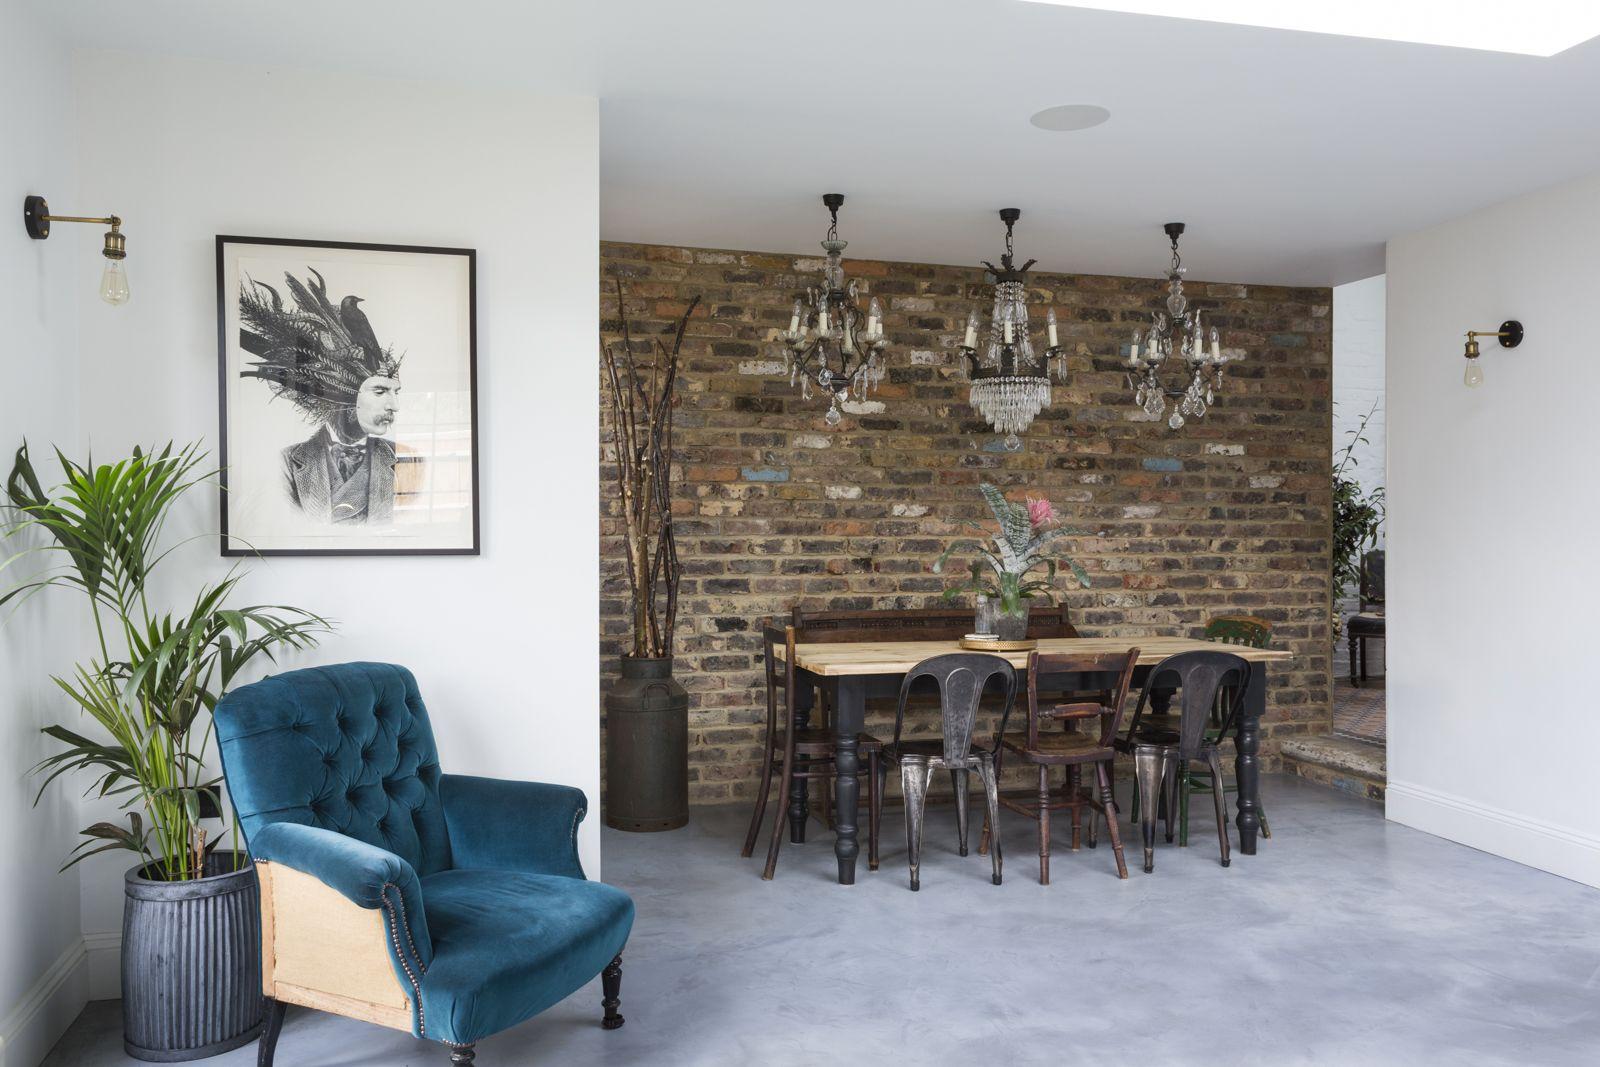 Kempshott road u a stunning bedroom victorian location house in